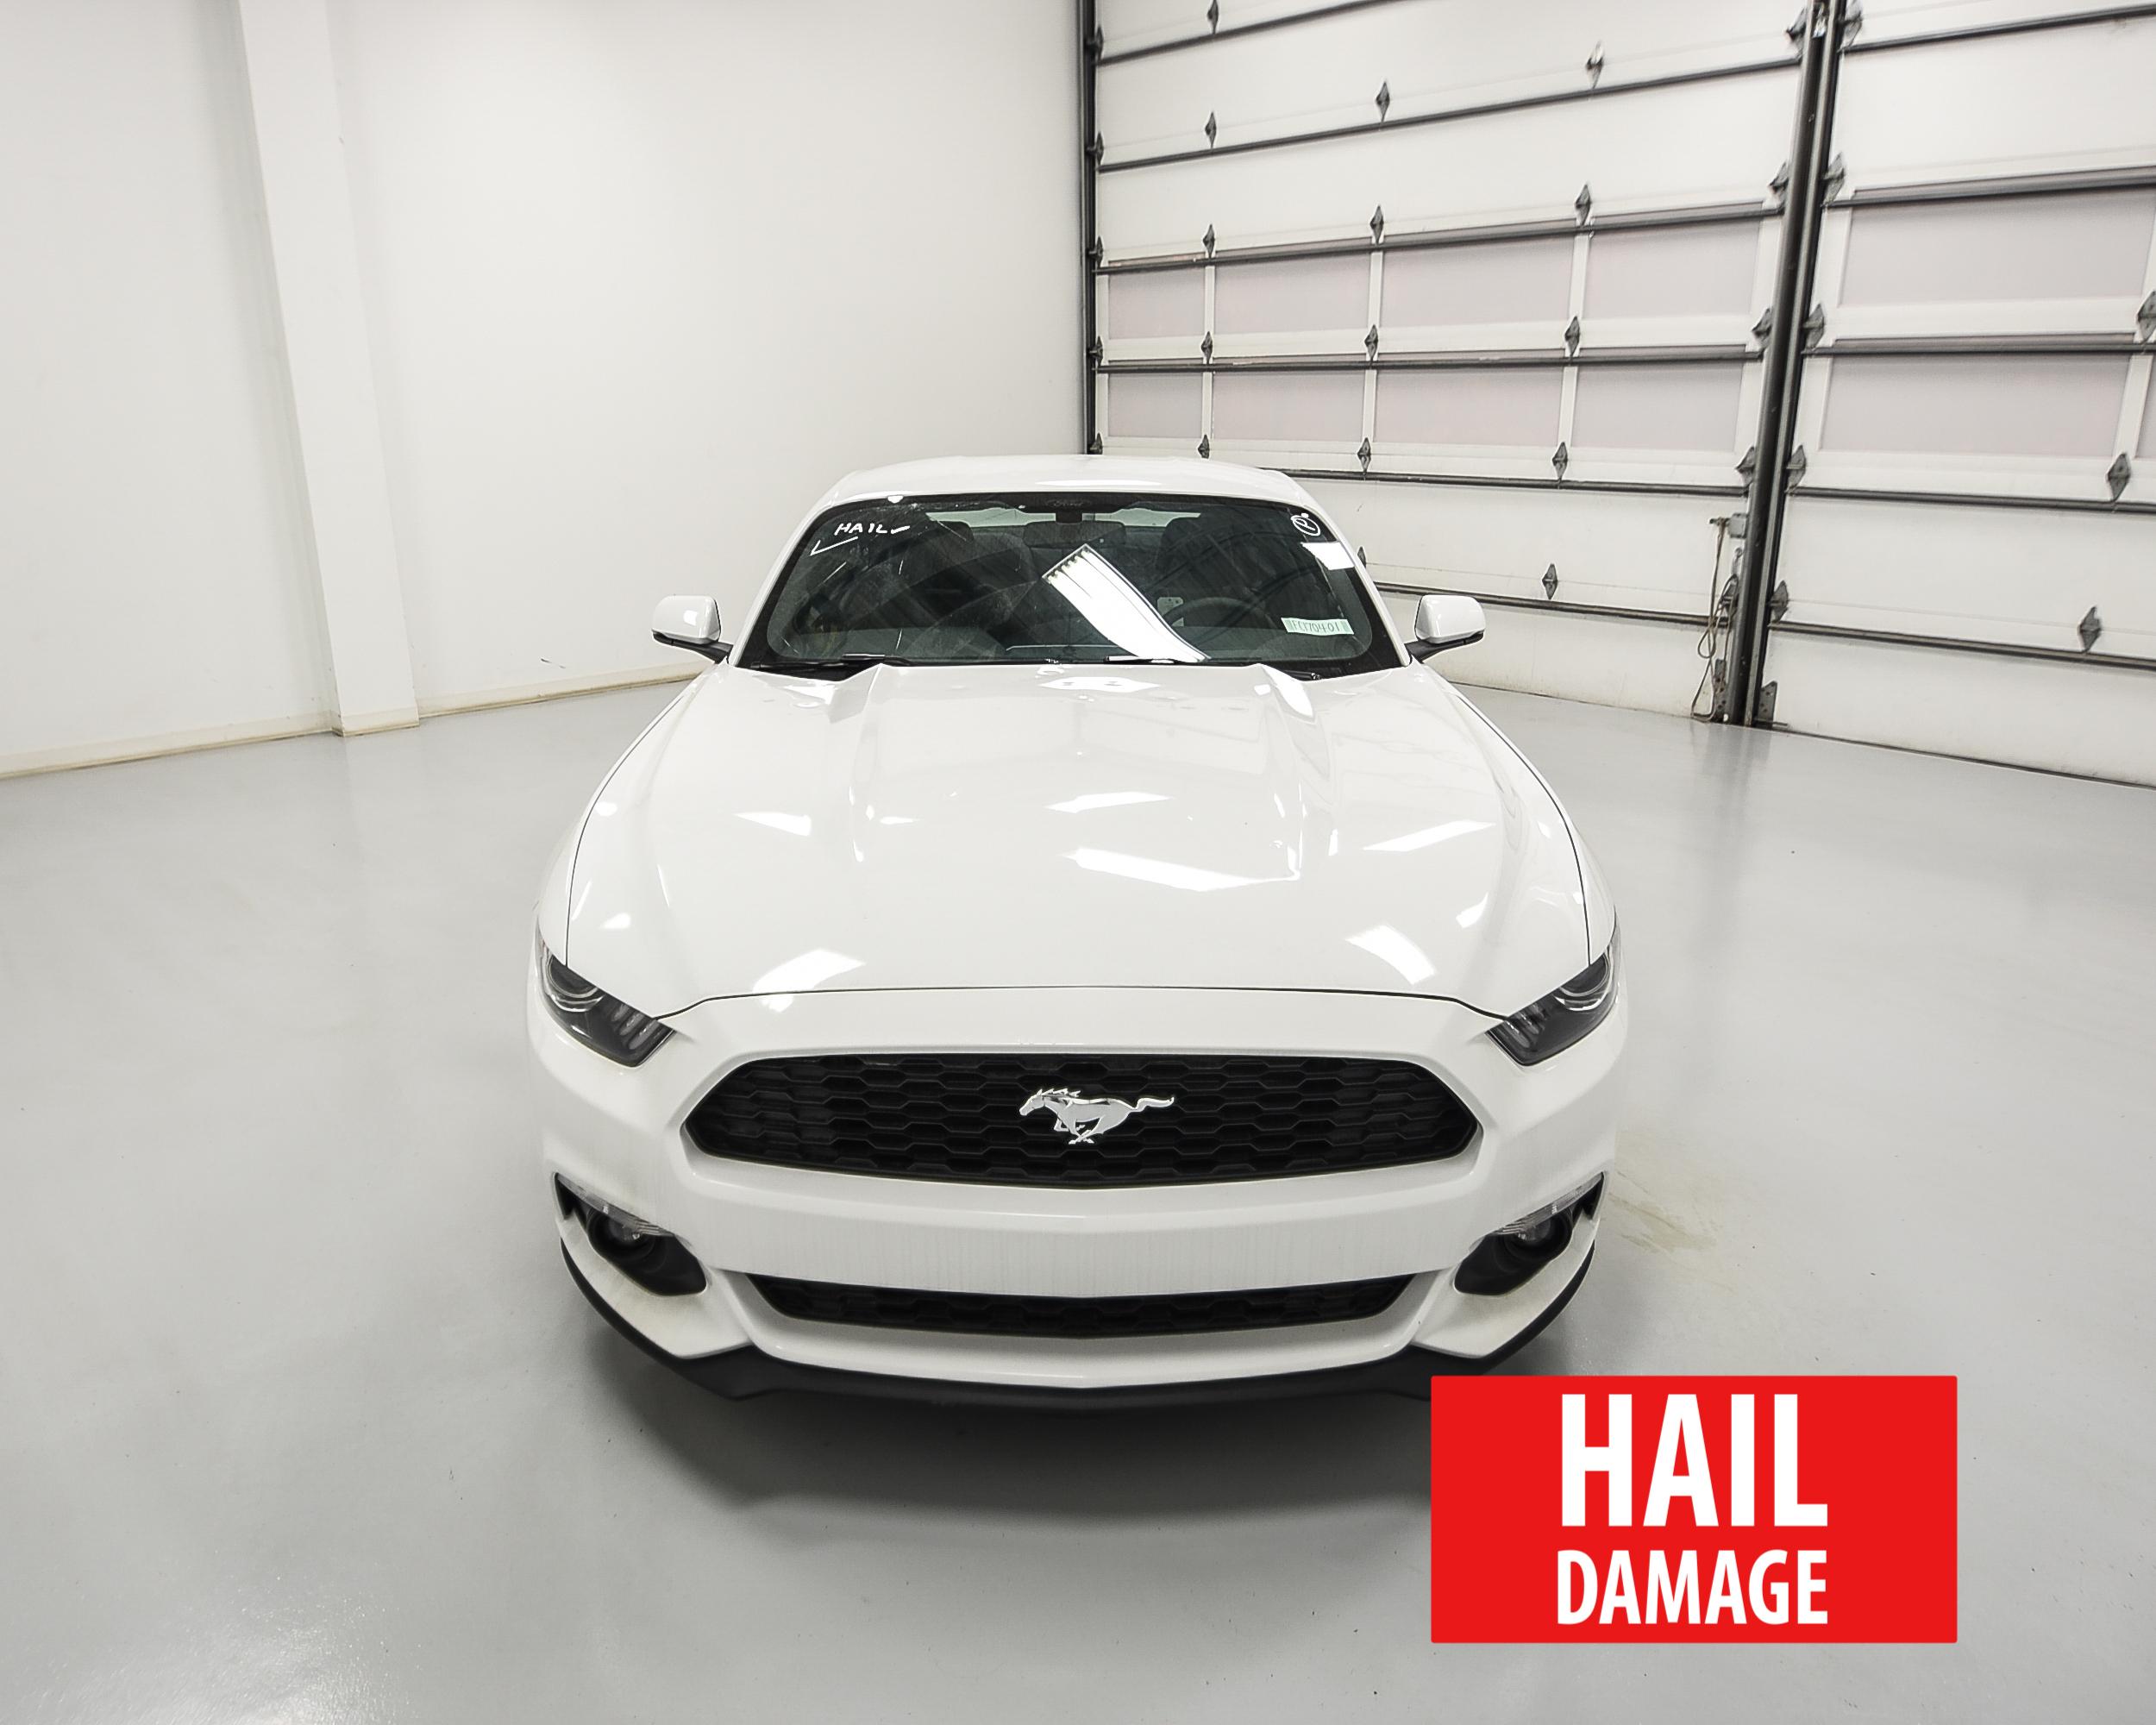 Woodhouse Hail Damage >> Woodhouse Ford Hail Damage | Autos Post